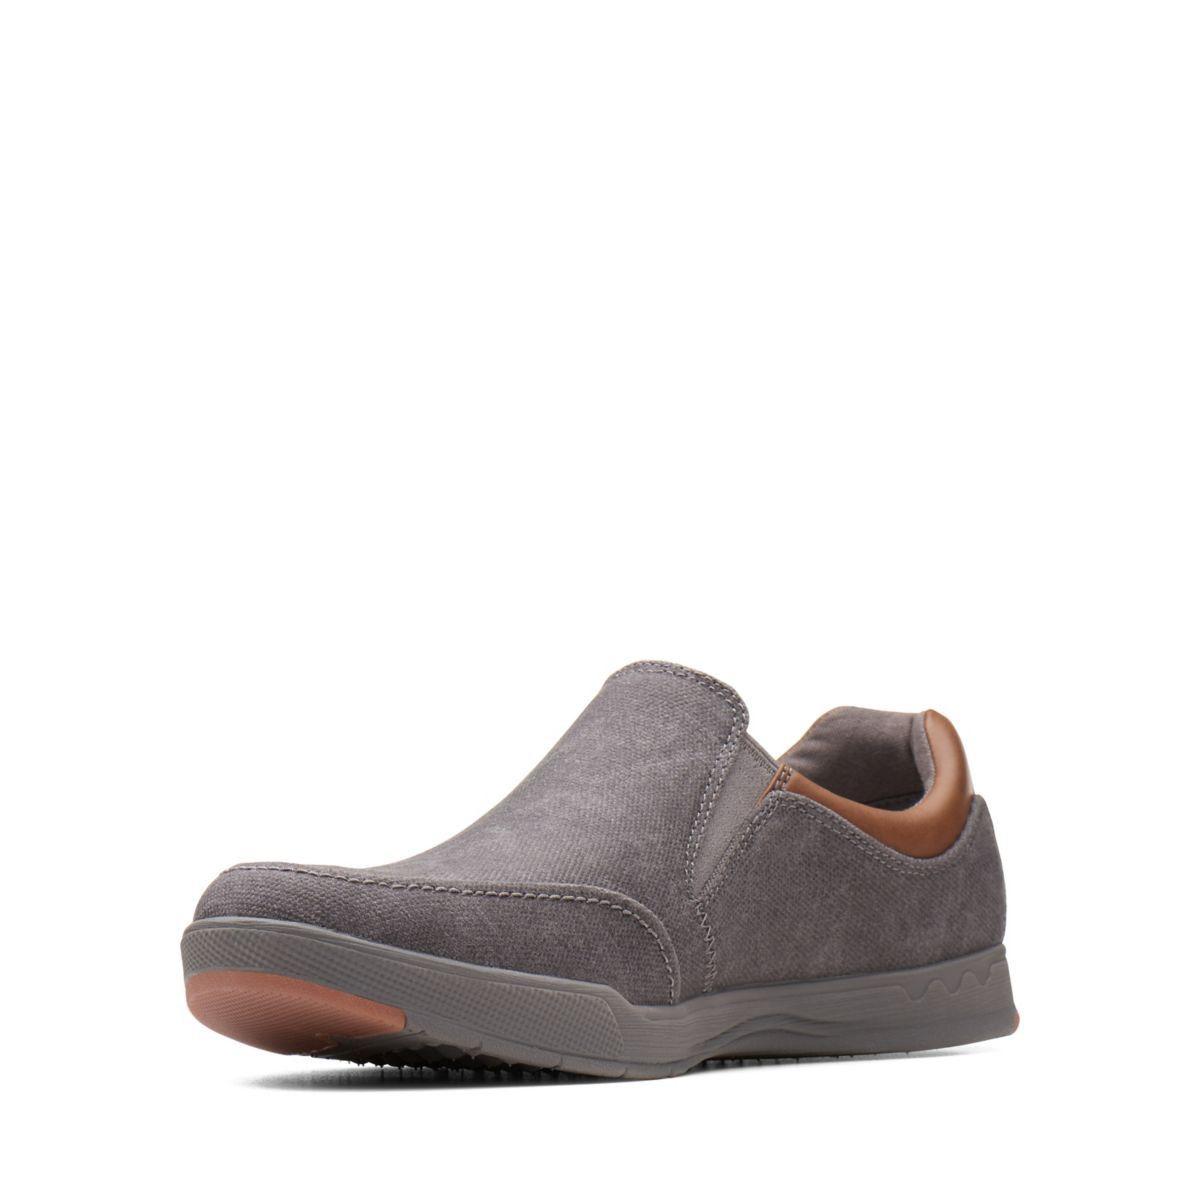 17162be9b4715 Clarks Step Isle Slip - Mens Shoes Dark Grey 8 Gray